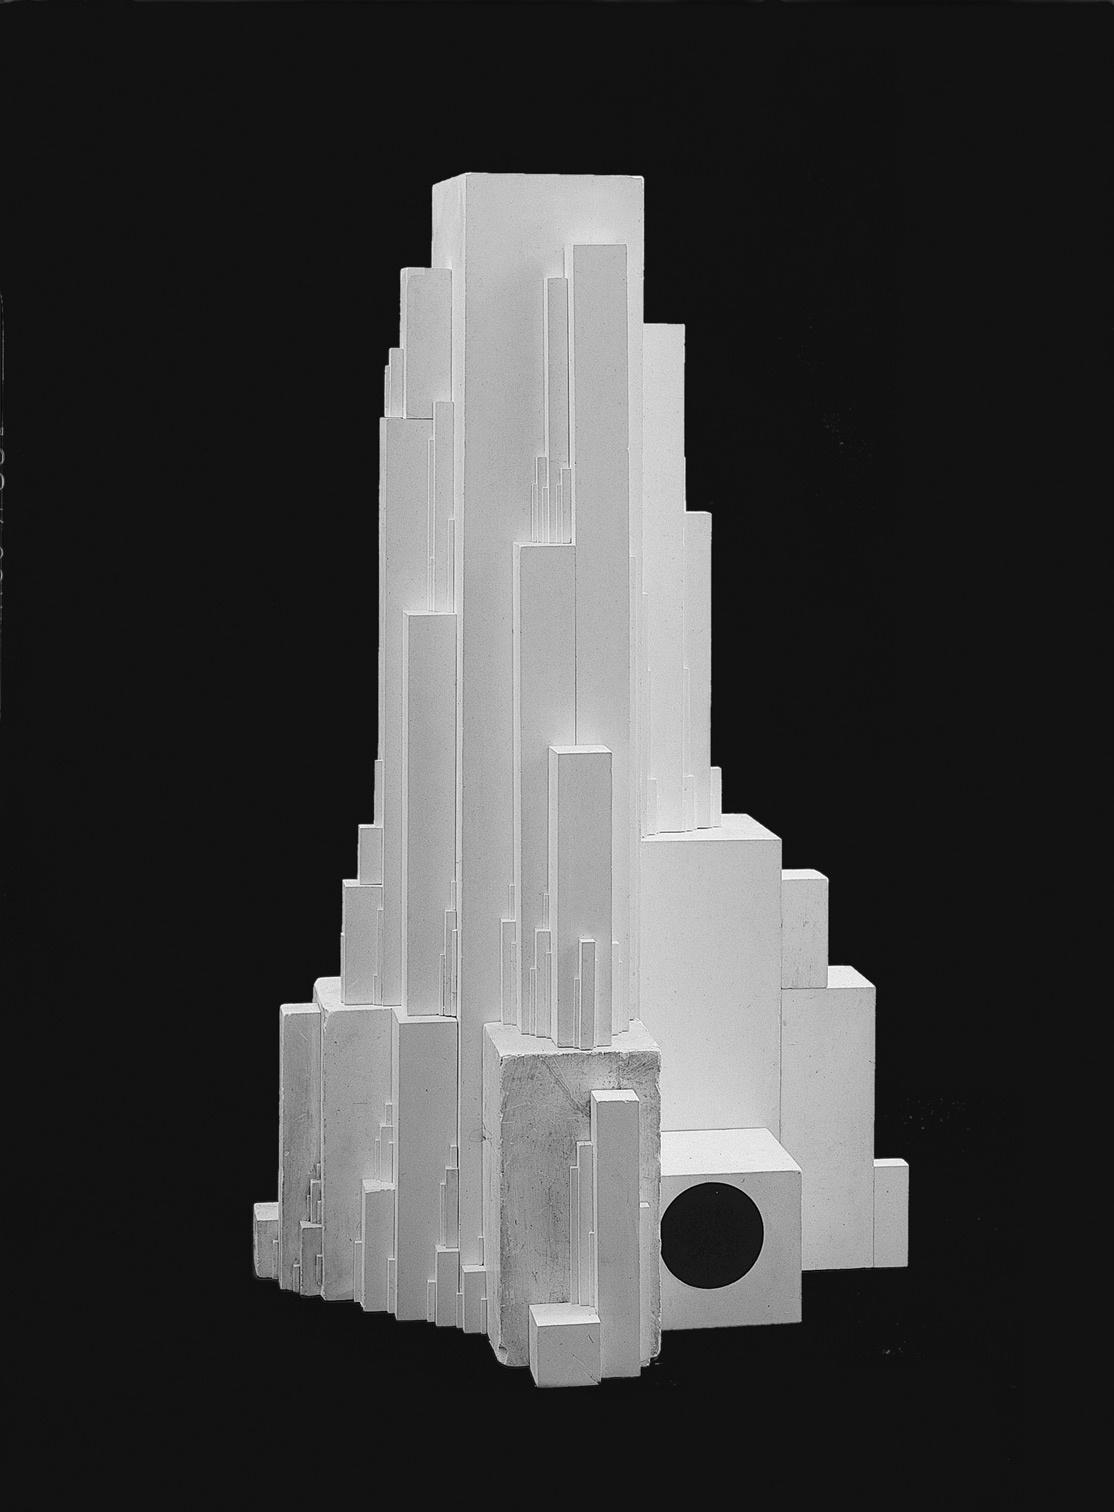 Architekton Gota Enlarge. Kazimir Malevich. Architekton Gota (Arkitekton Gota), 1923. Plaster. 85.3 x 56 x 52.5 cm. Russian State Museum, St. Petersburg